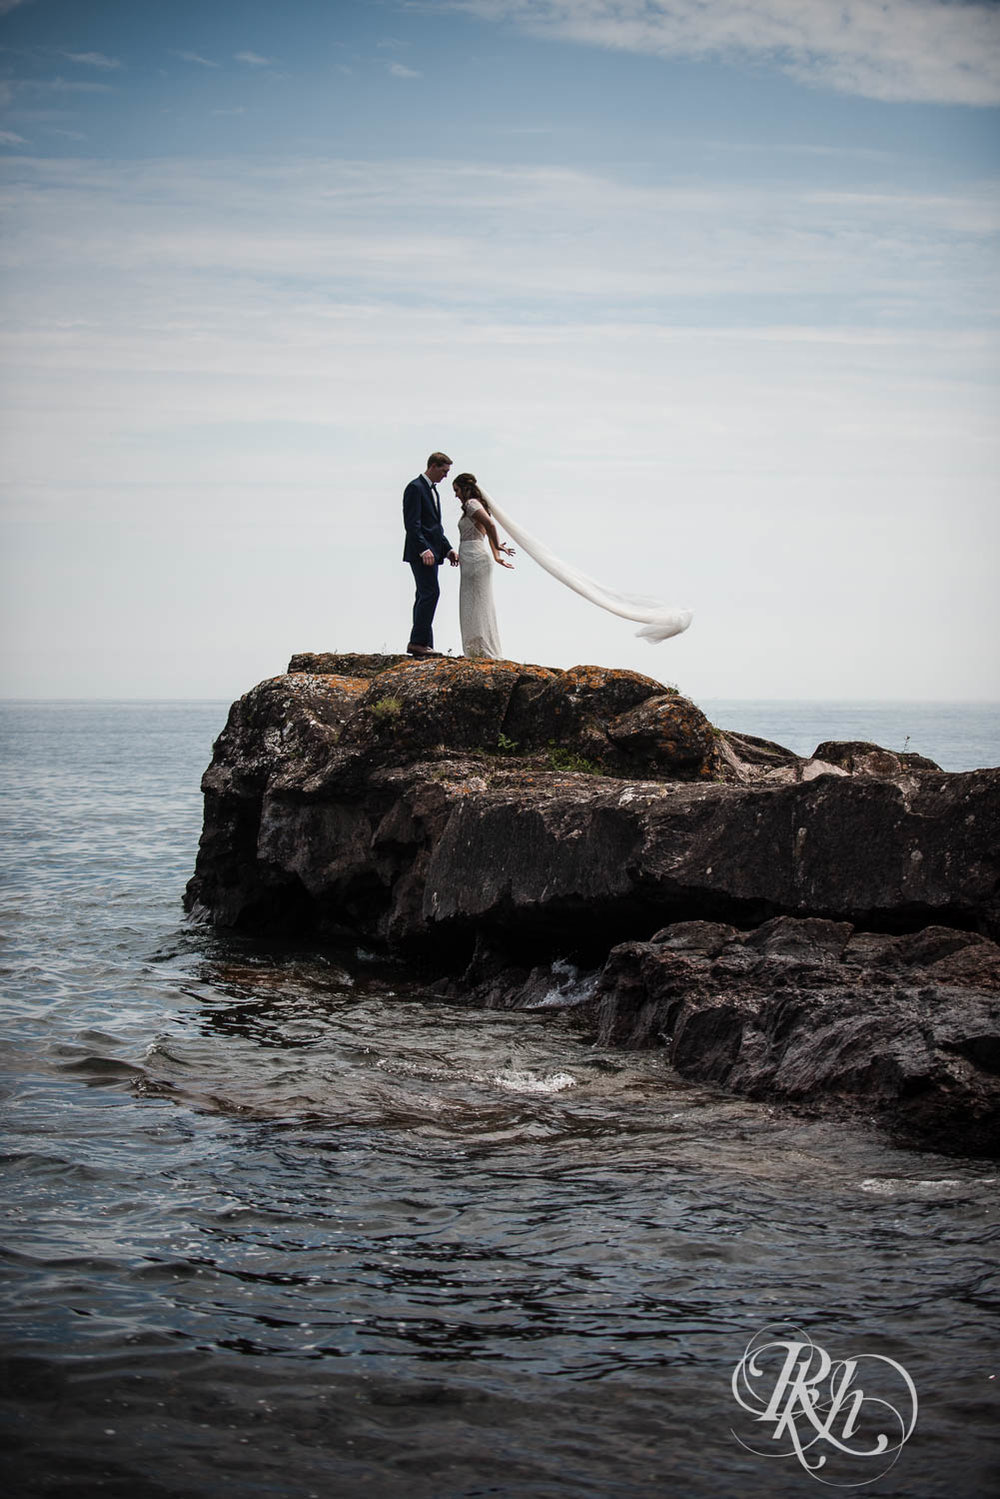 Kayla & John - Minnesota Wedding Photography - North Shore Wedding Photography - Bluefin Bay - RKH Images   (46 of 55).jpg